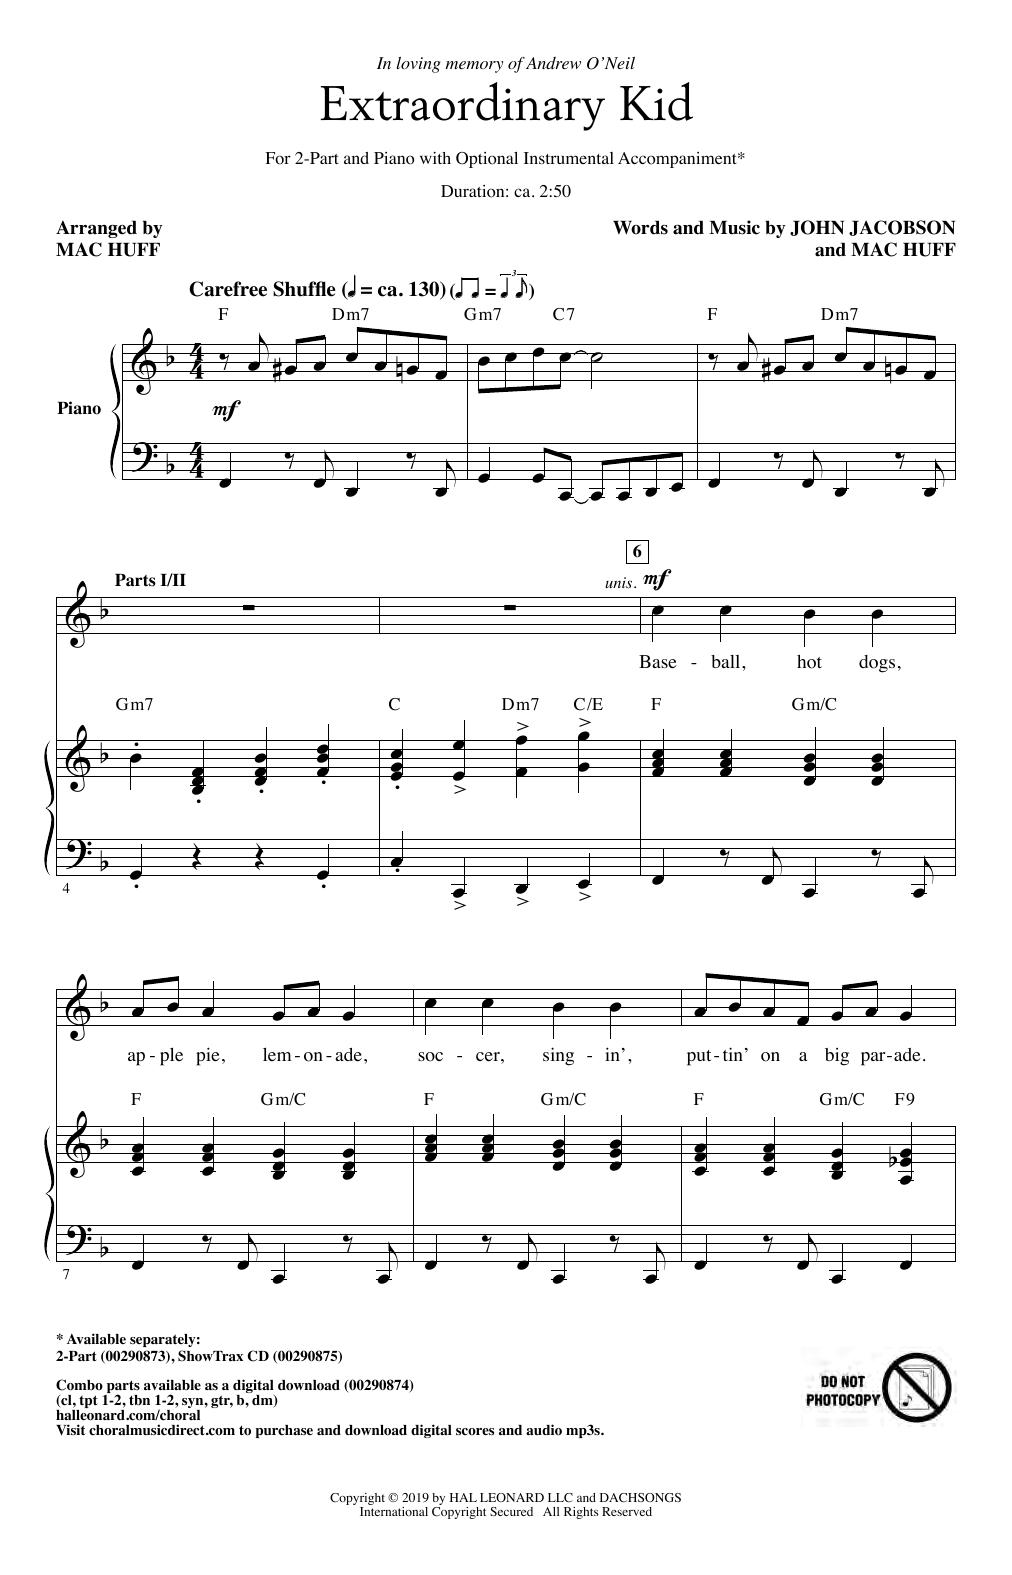 John Jacobson & Mac Huff Extraordinary Kid sheet music notes and chords